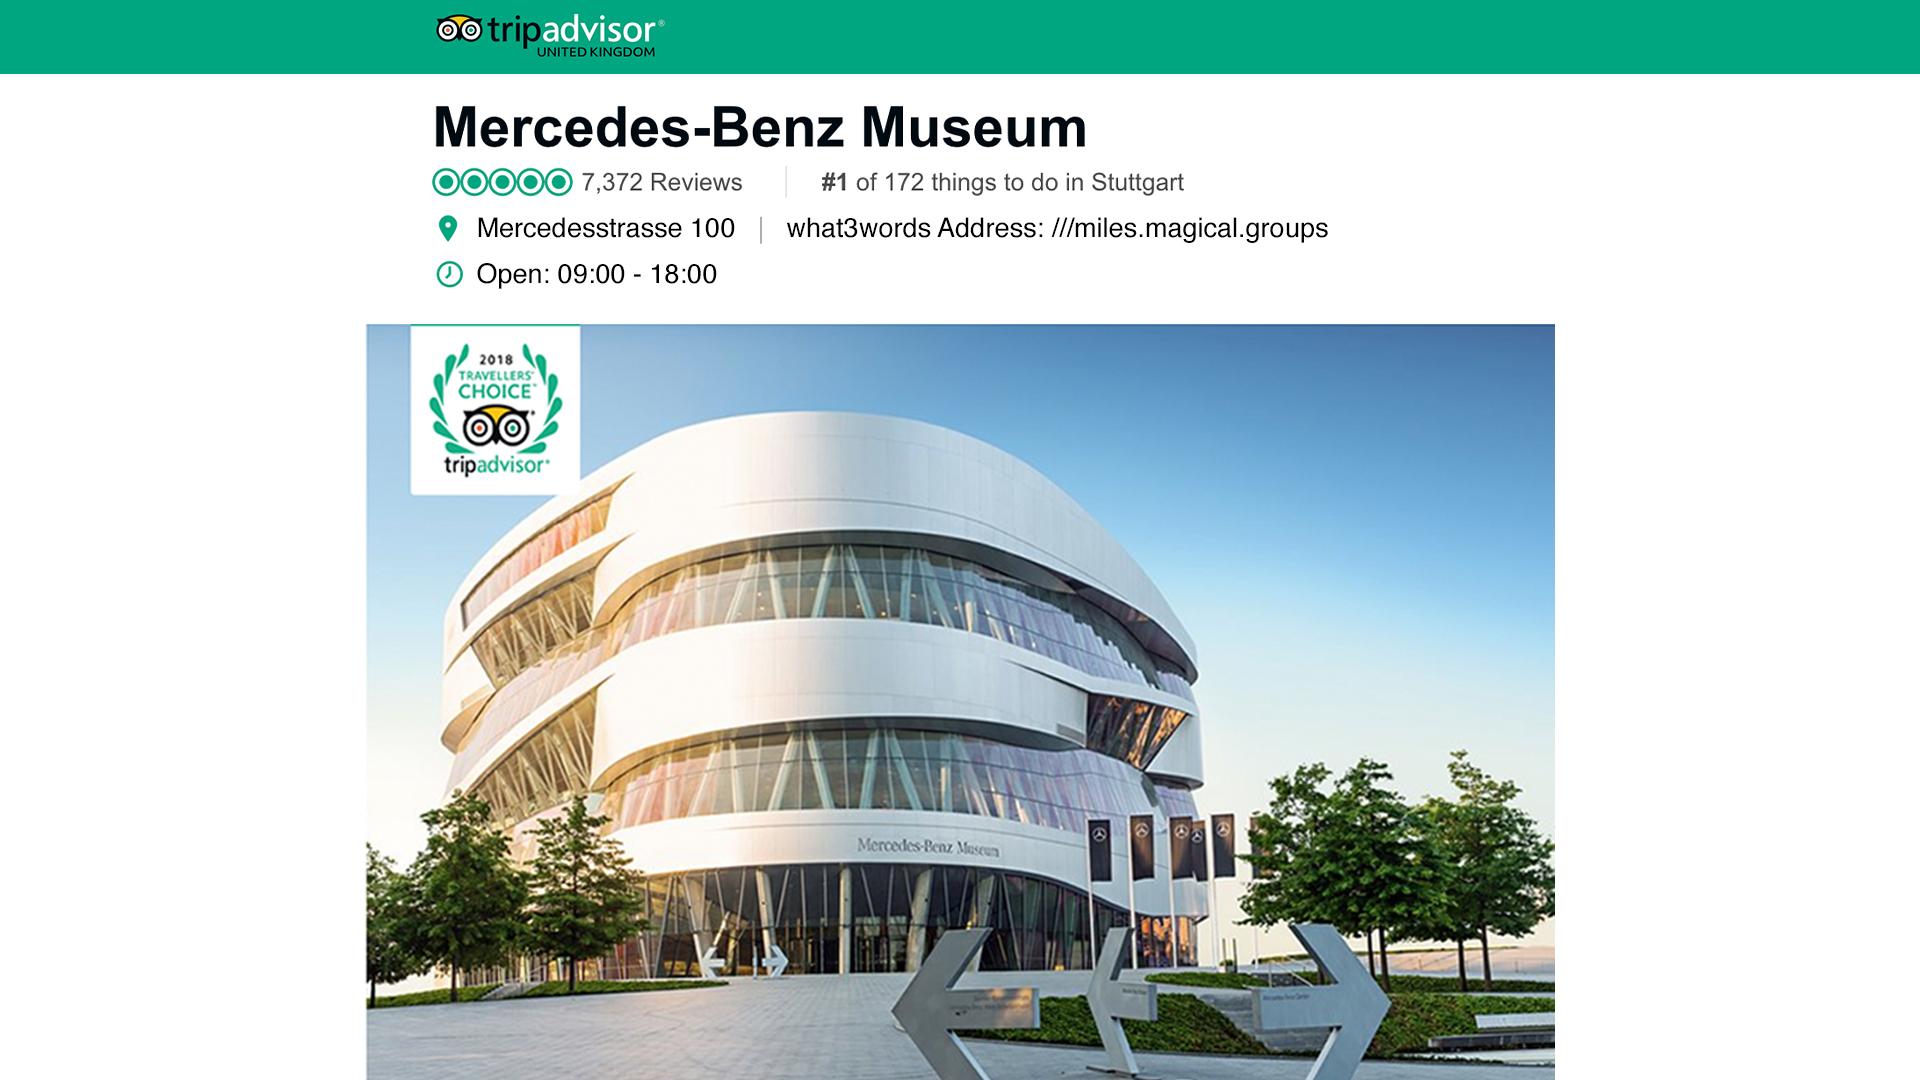 trip advisor Mercedes - Benz museum